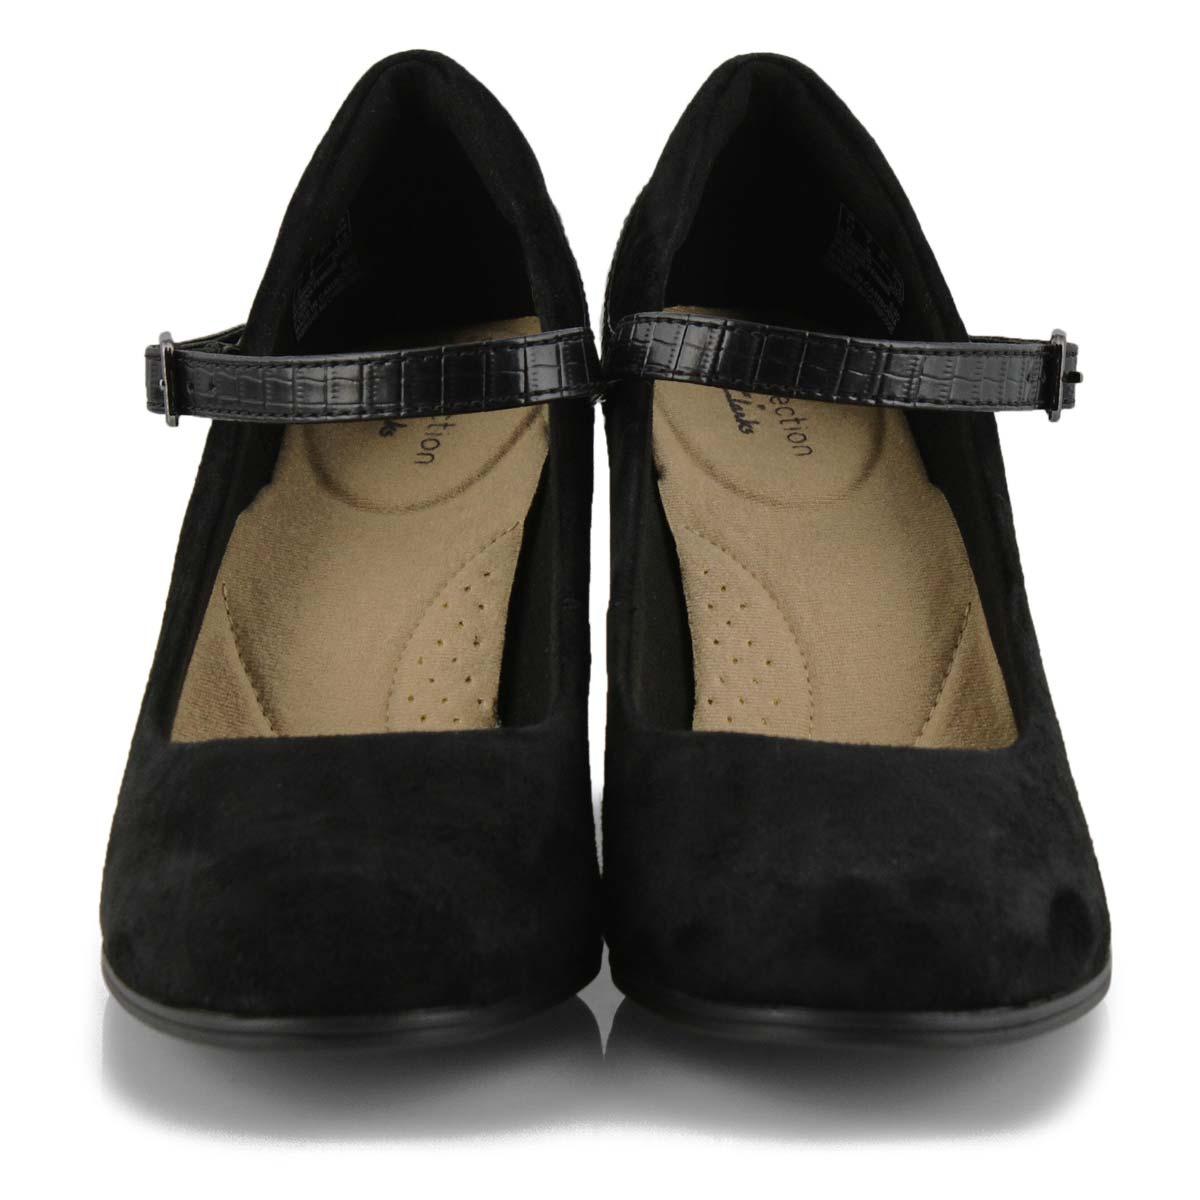 Women's Alayna Shine Dress Shoe - Black